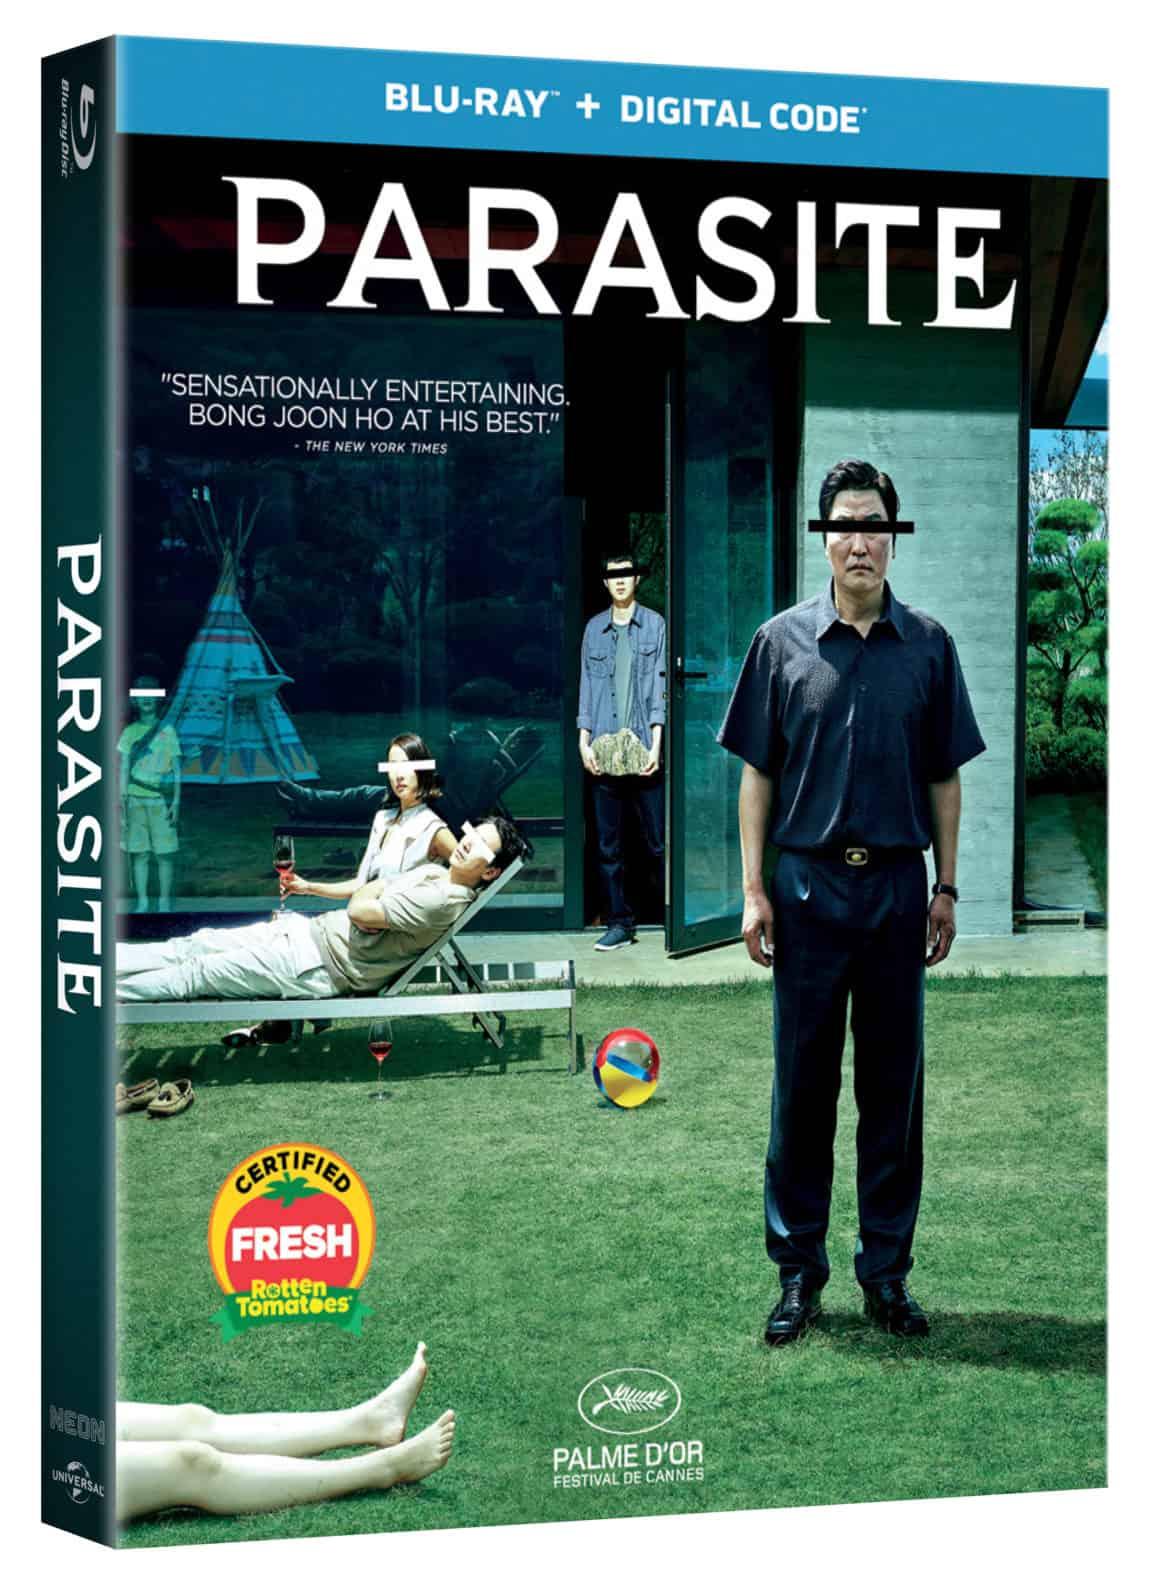 Parasite blu-ray box art